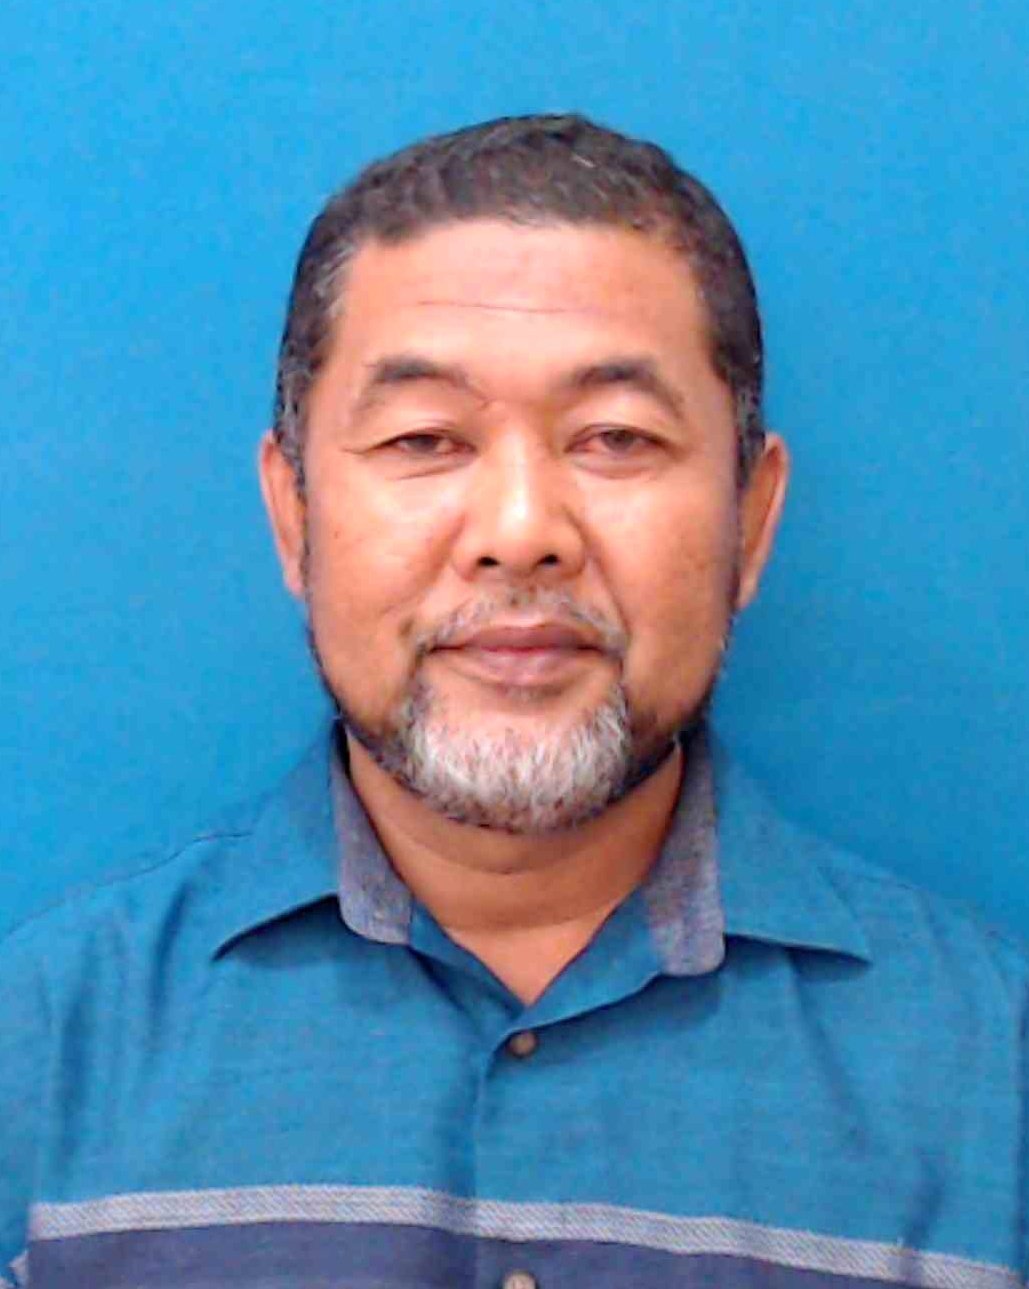 Mohamad Bin Awang